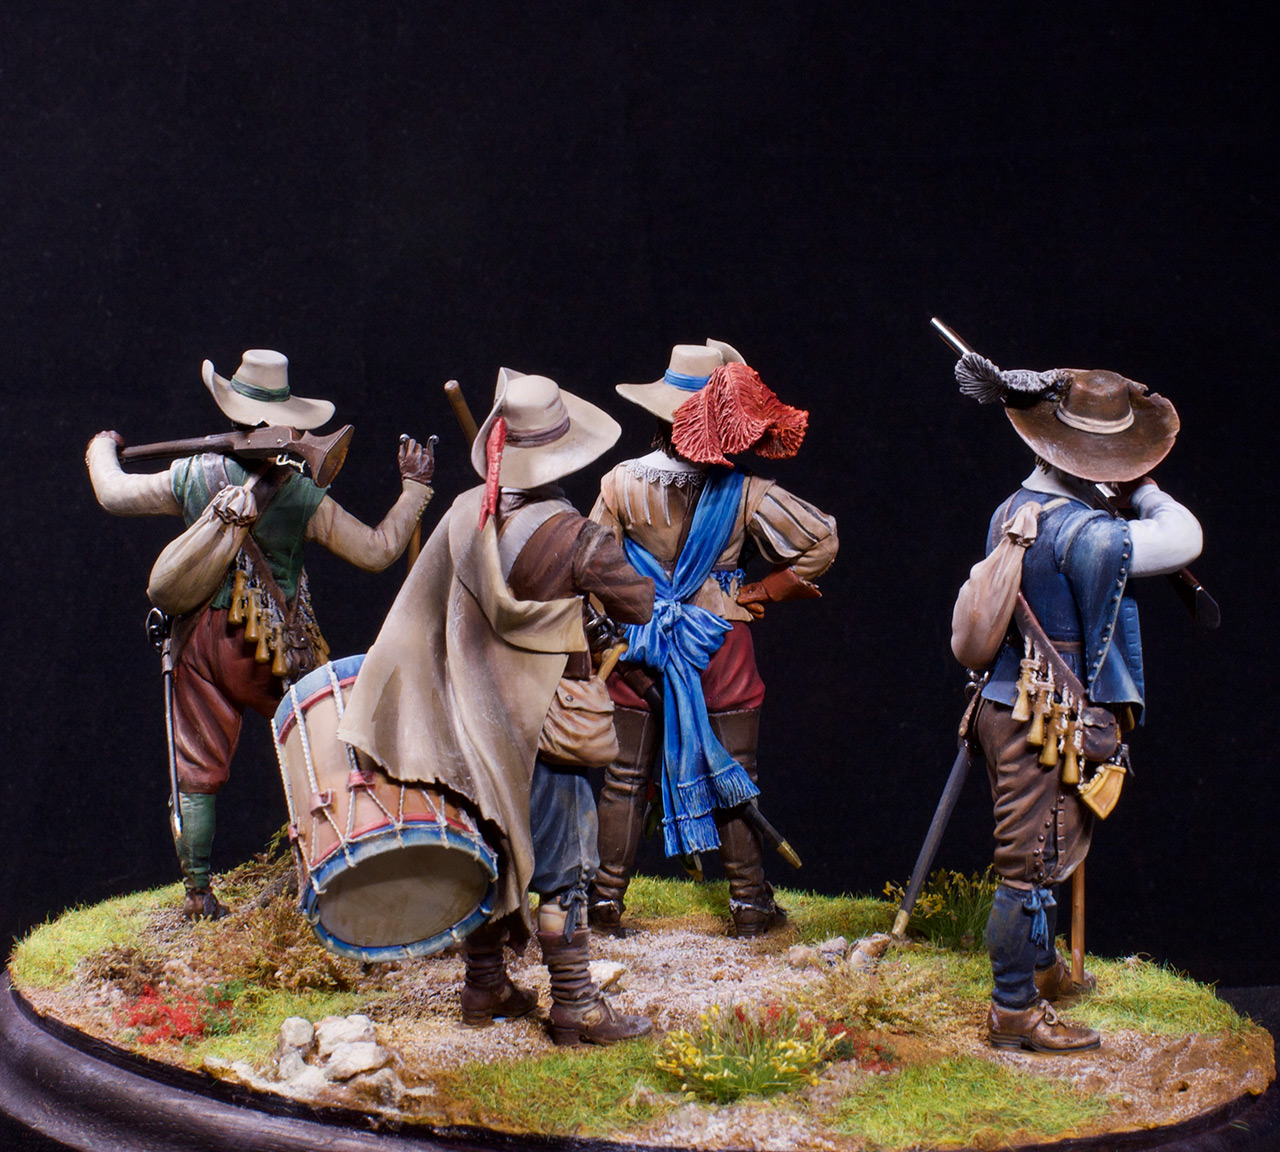 Фигурки: Мушкетеры, барабанщик и офицер, 1630 г. , фото #10